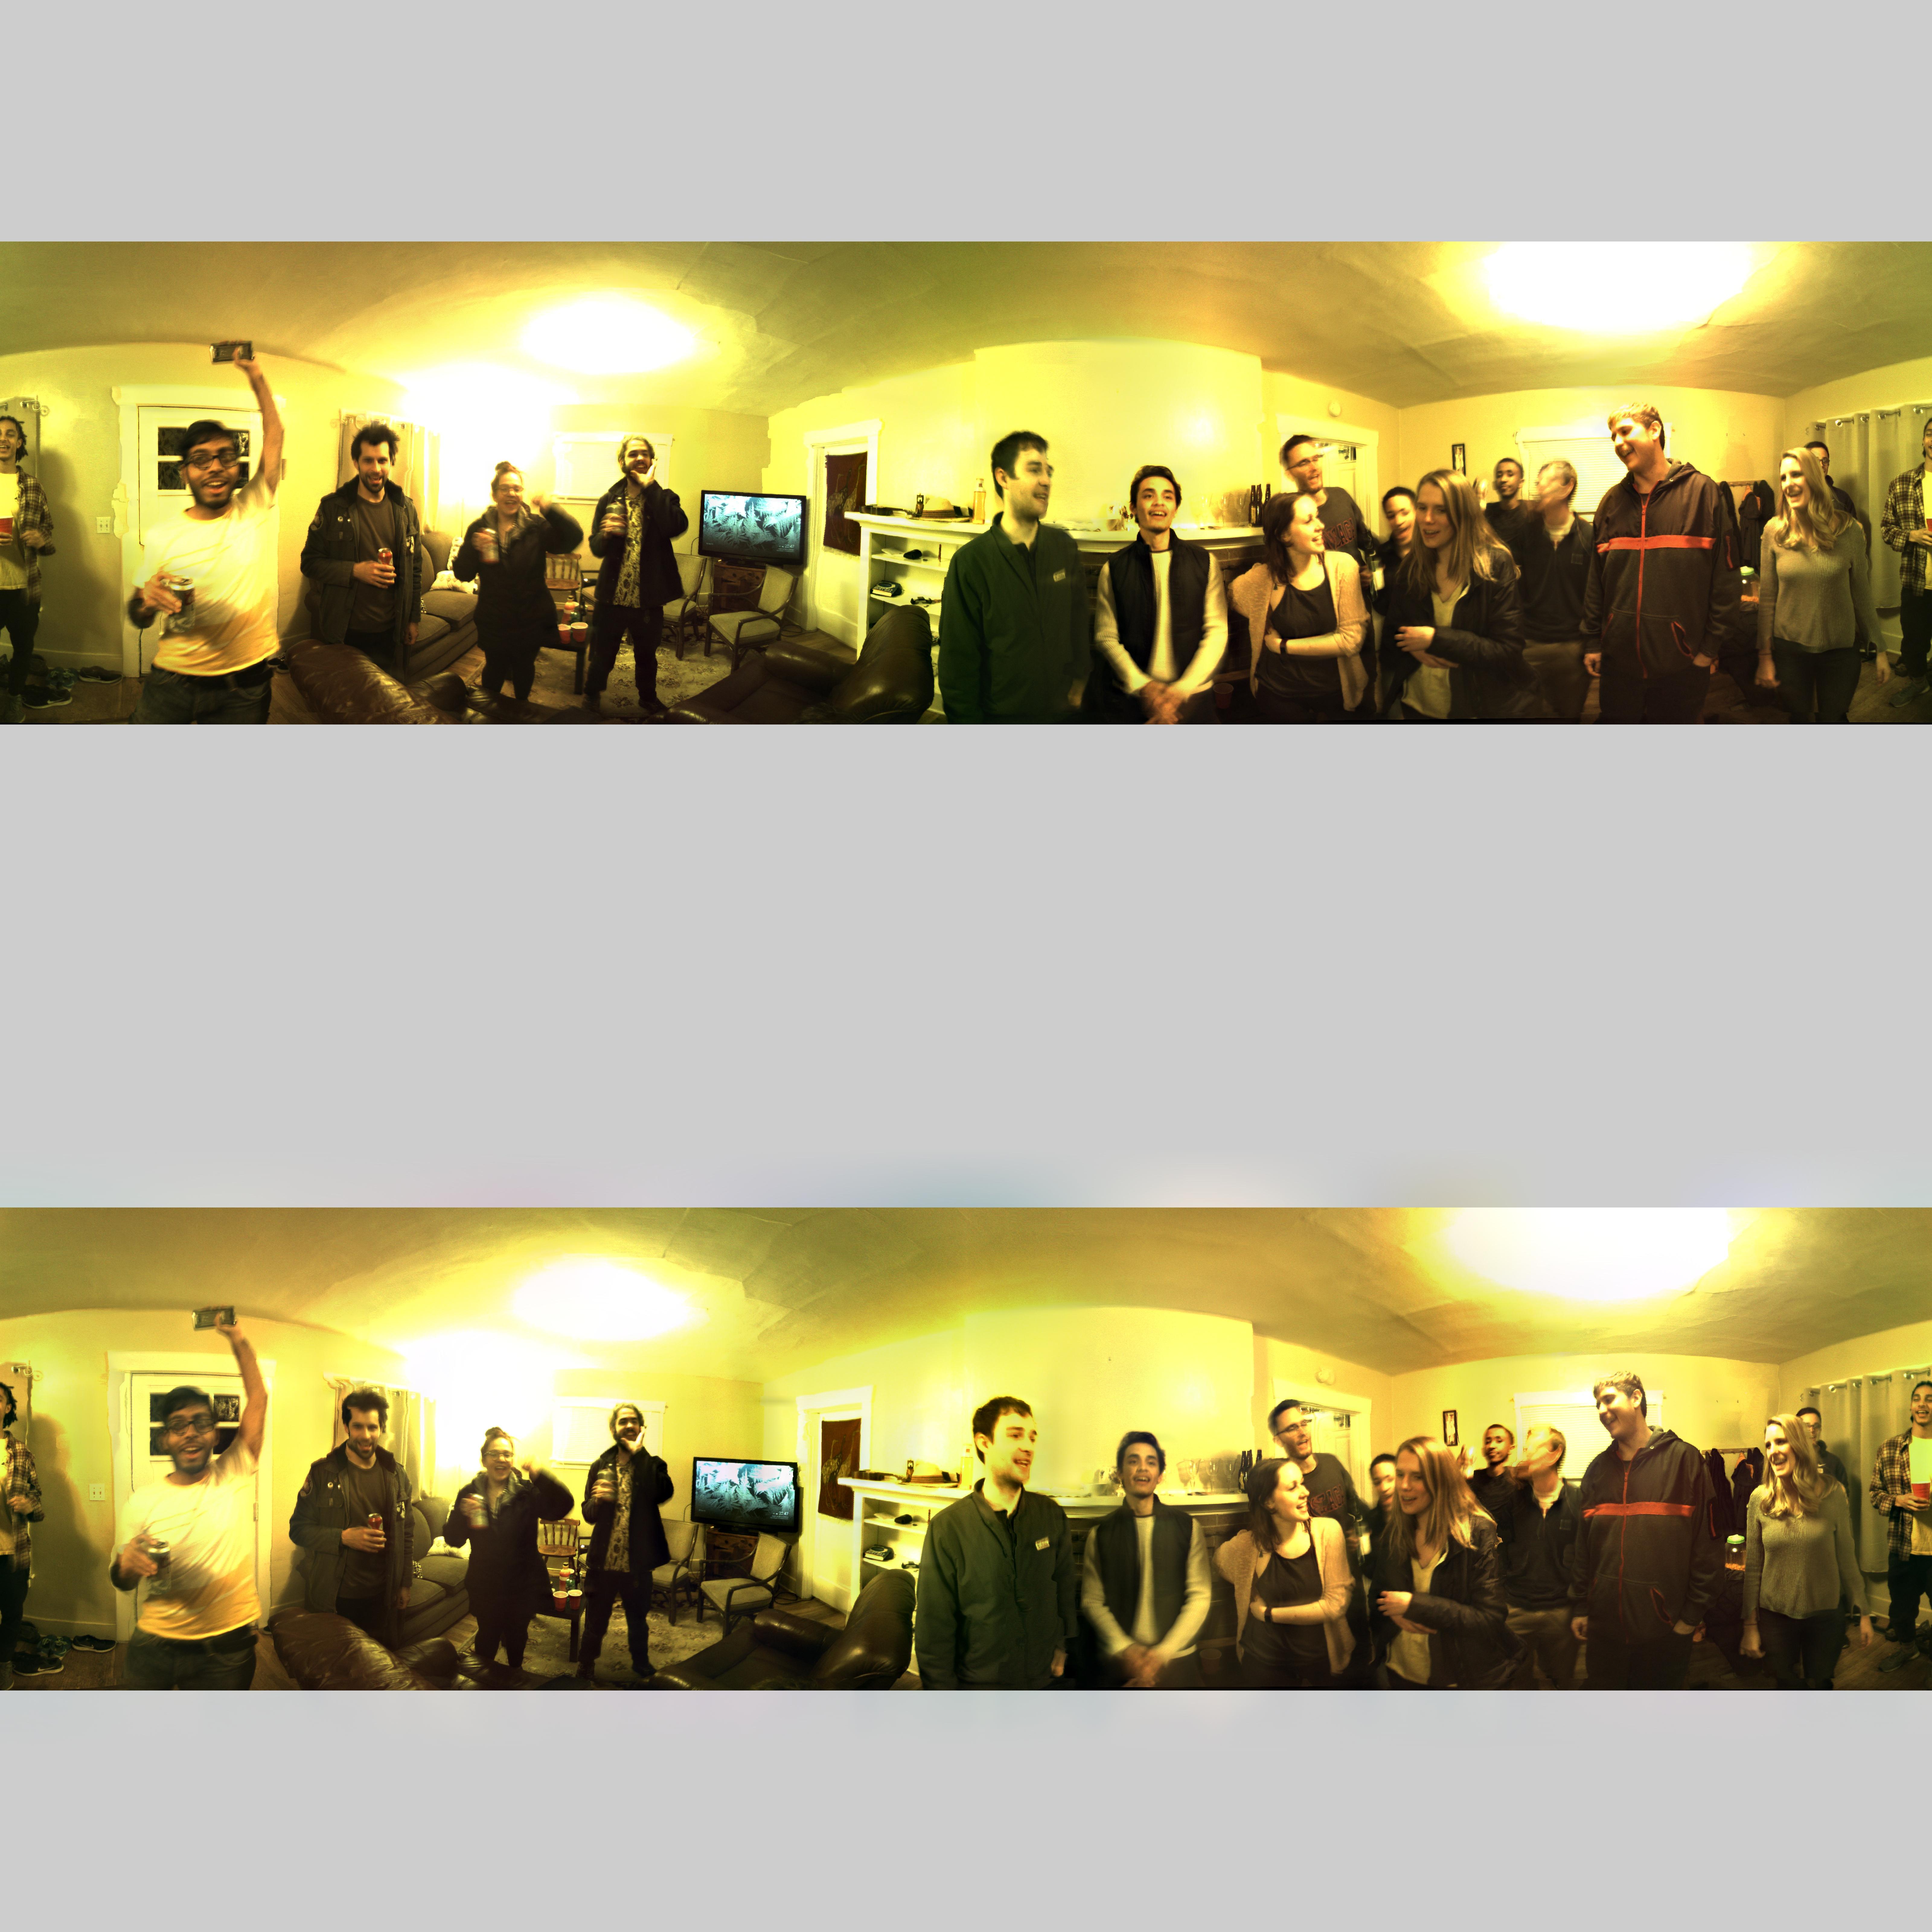 VR Camera: FPGA Stereoscopic 3D 360 Camera   Hackaday io